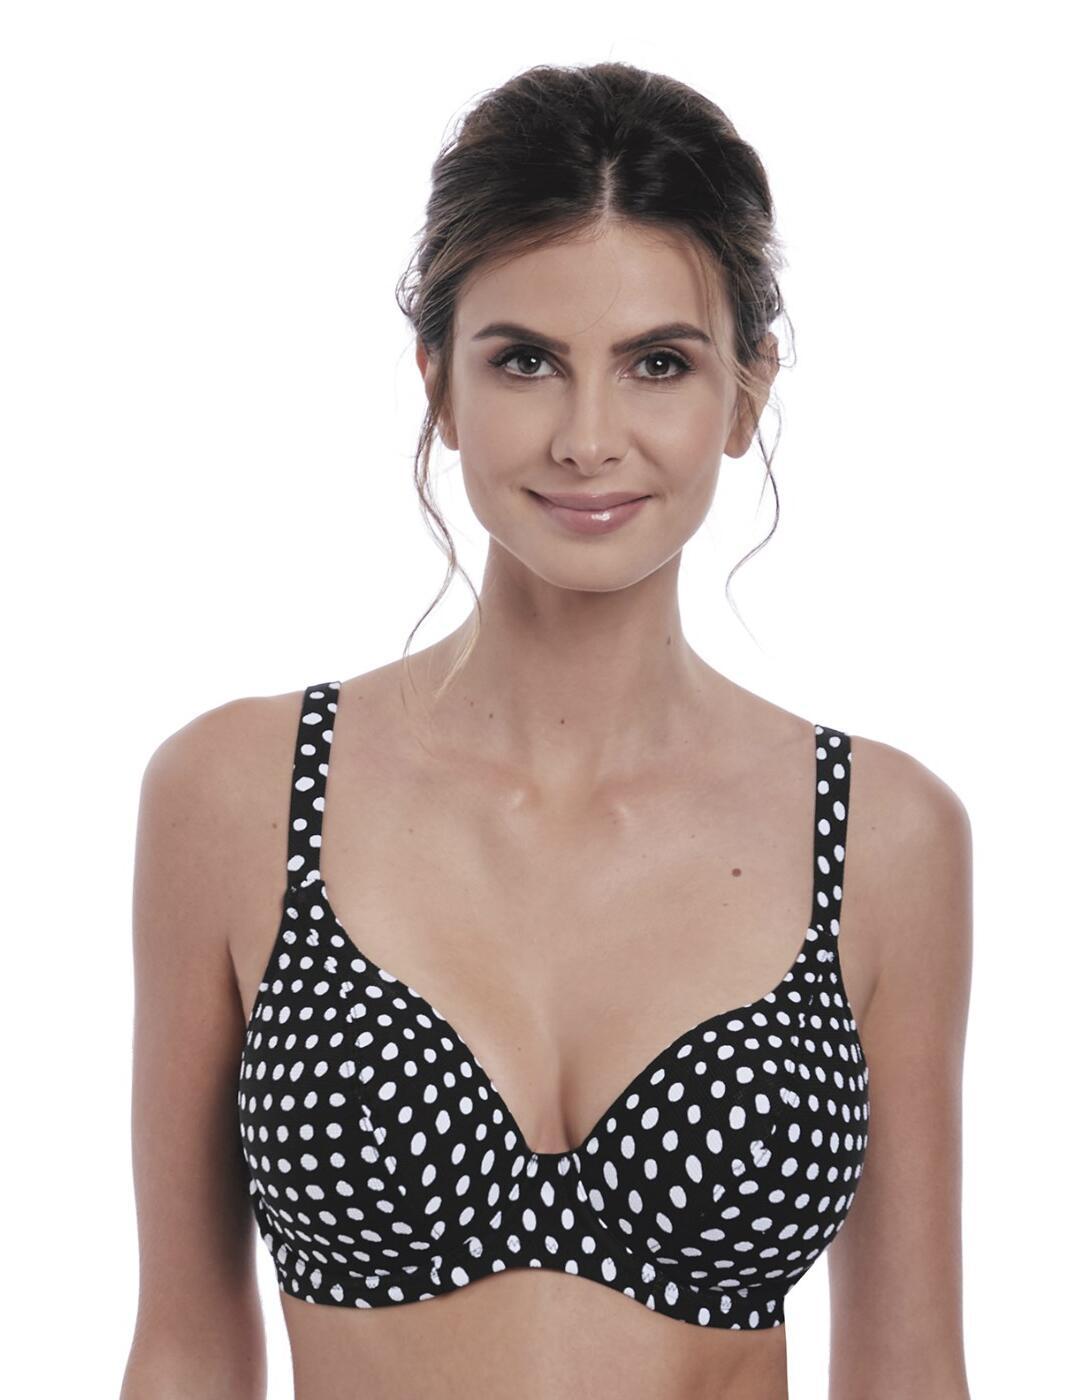 6722 Fantasie Santa Monica Underwired Plunge Bikini Top - 6722 Black/White